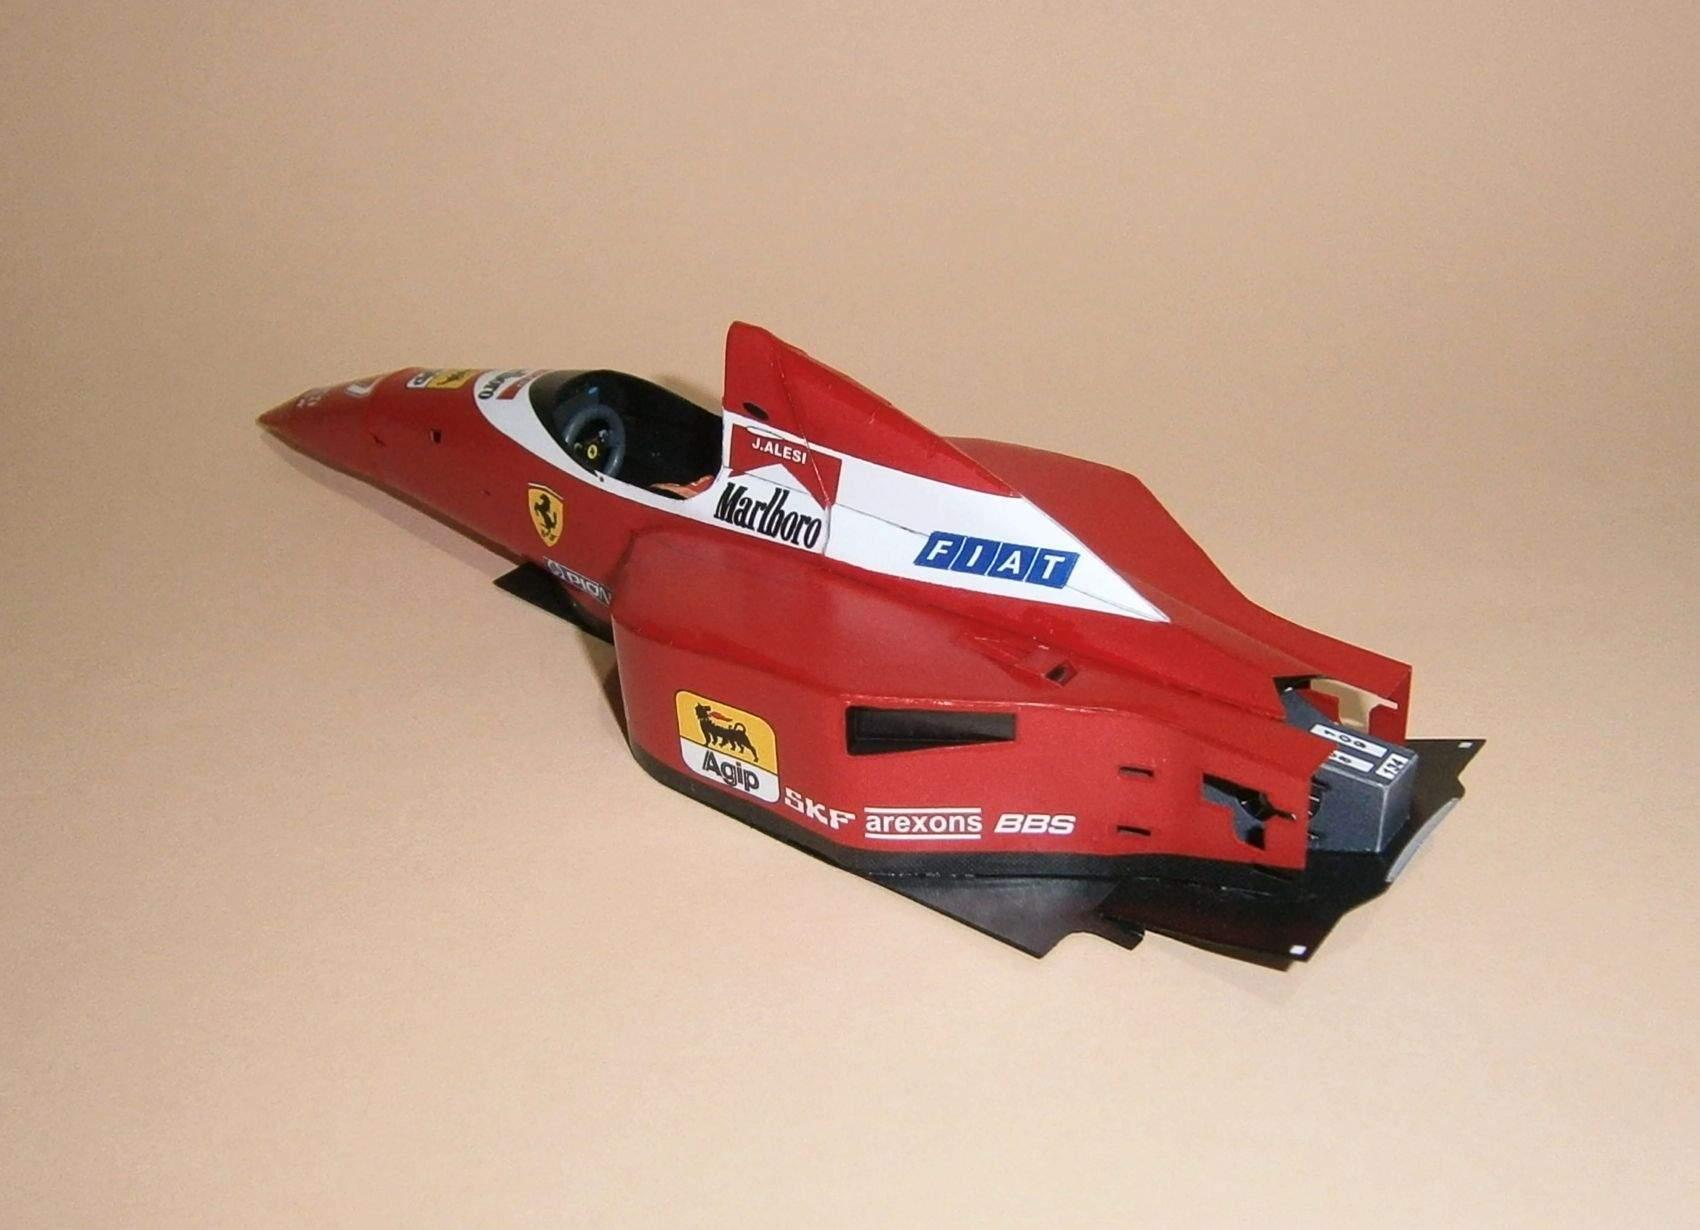 Ferrari F93 - J.Alesi, GP Monaco 1993